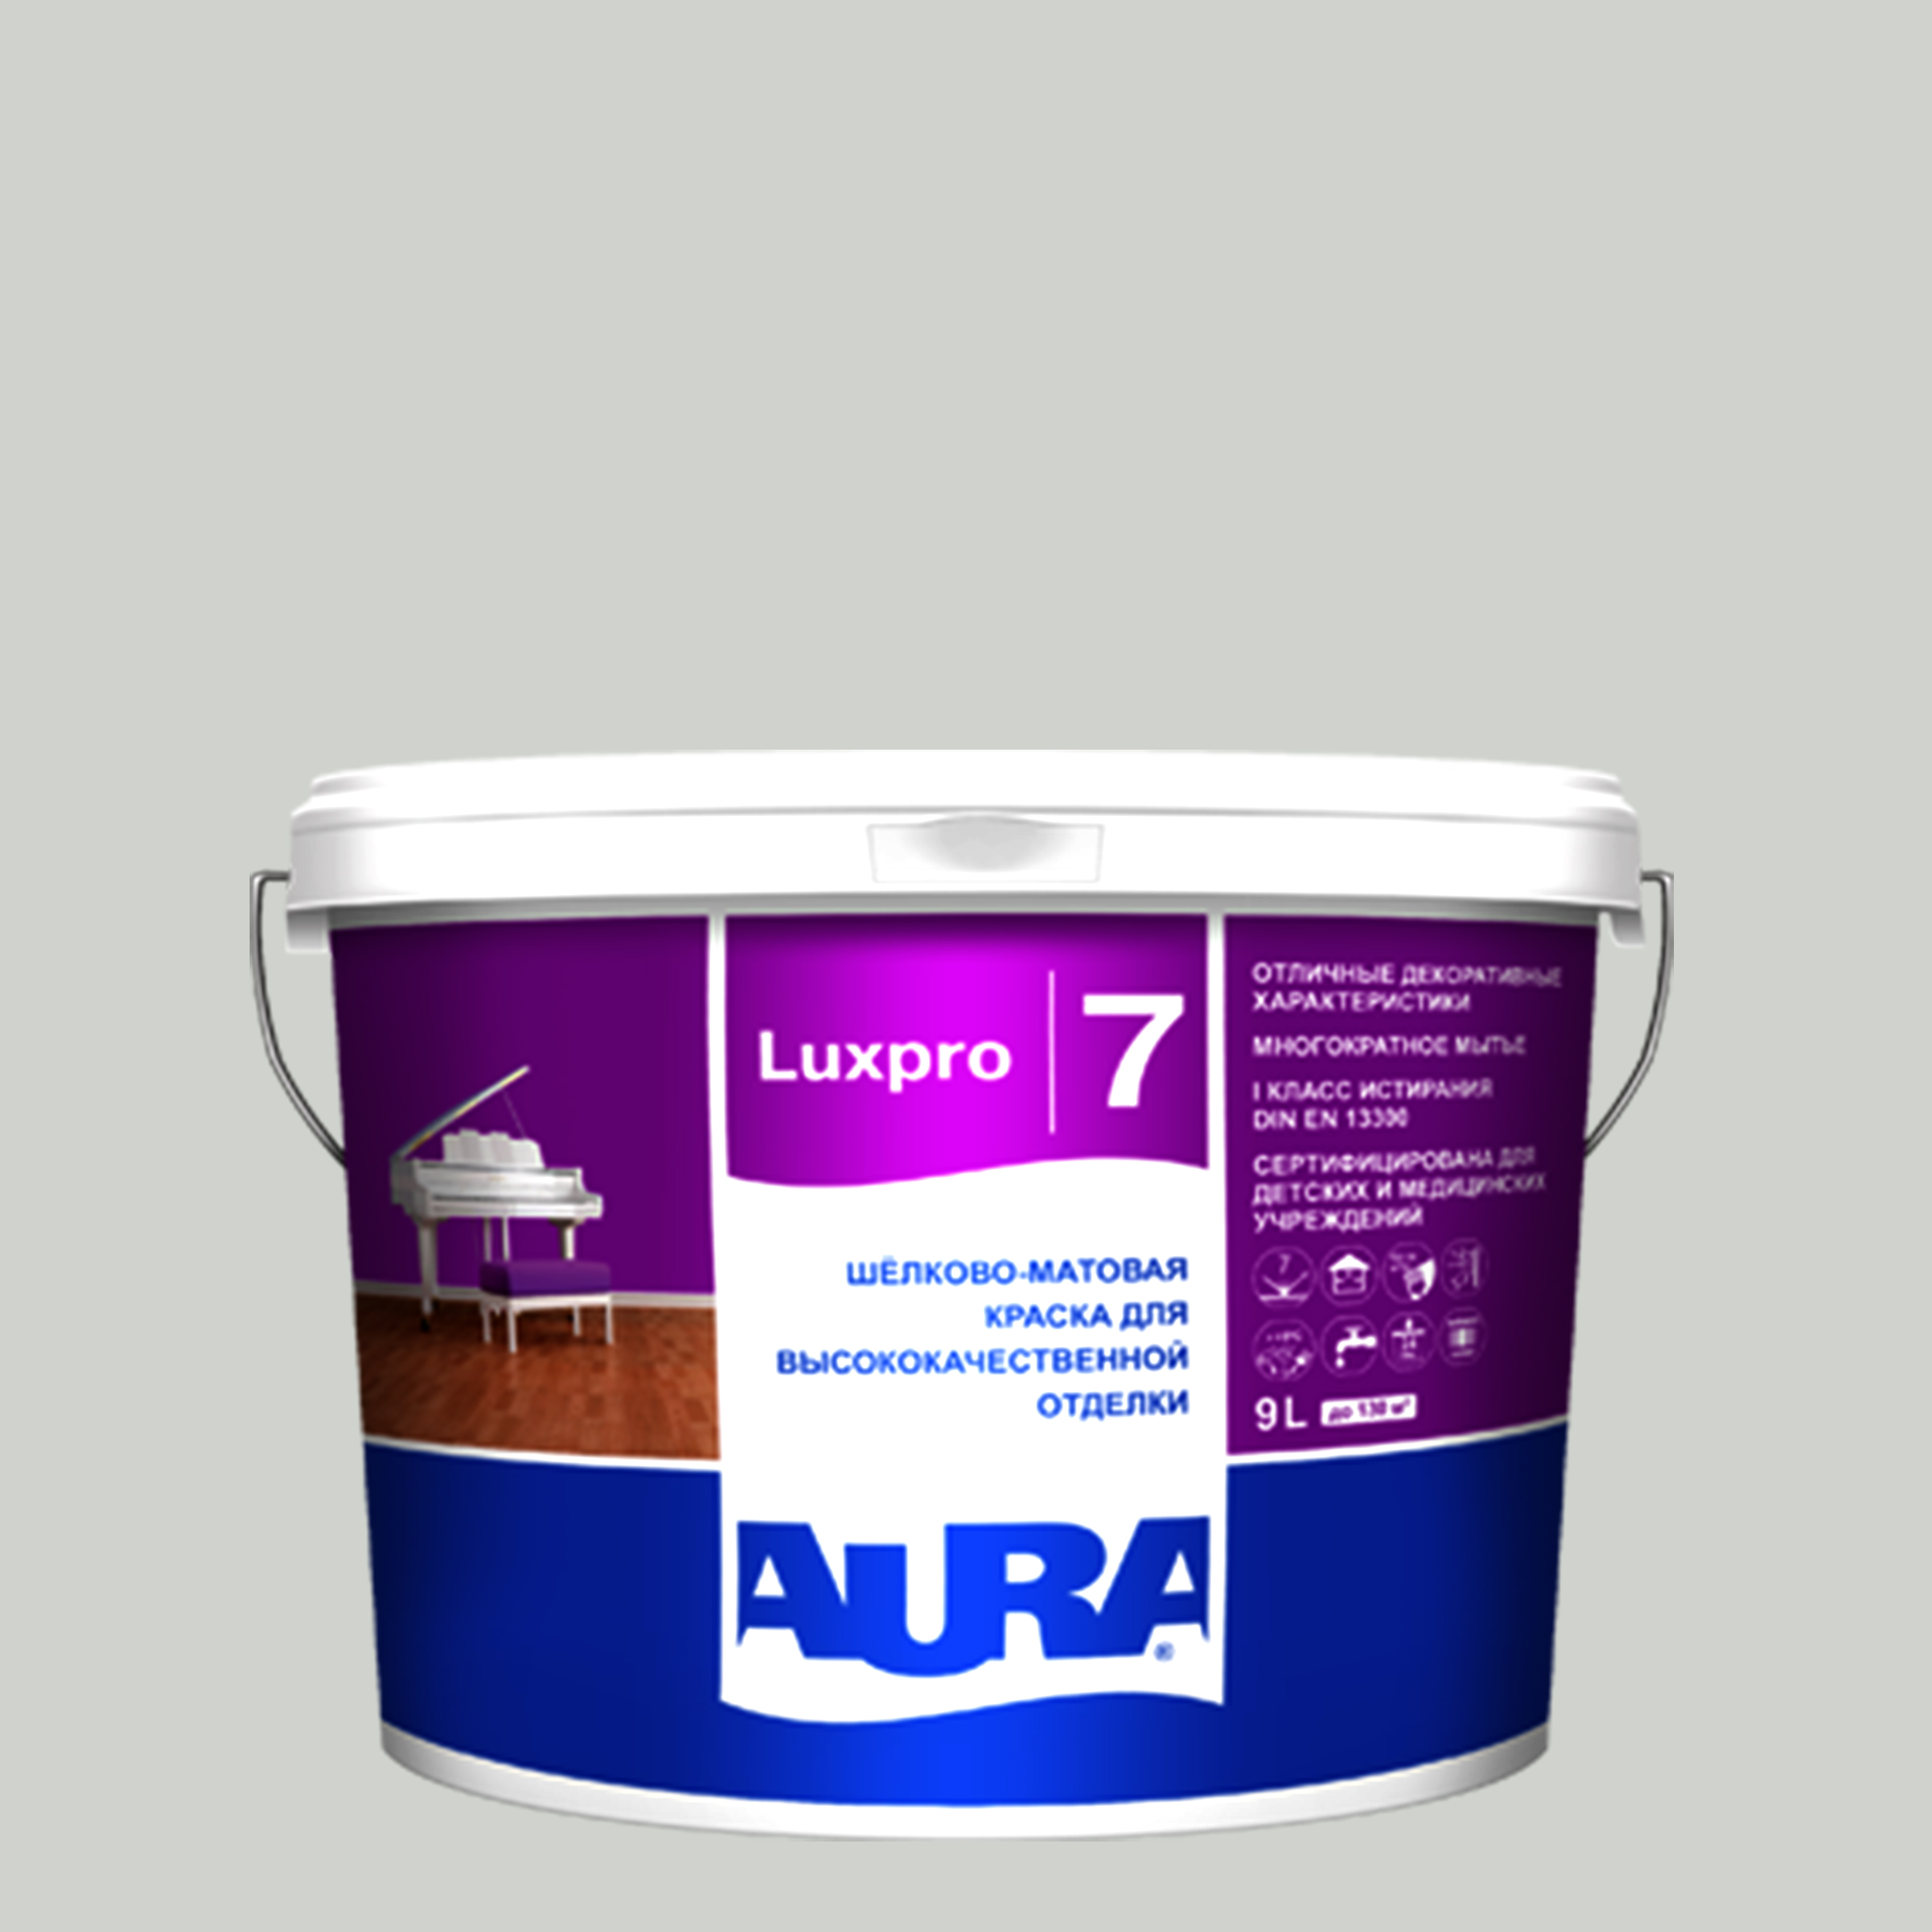 Фото 4 - Краска интерьерная, Aura LuxPRO 7, RAL 7023, 11 кг.